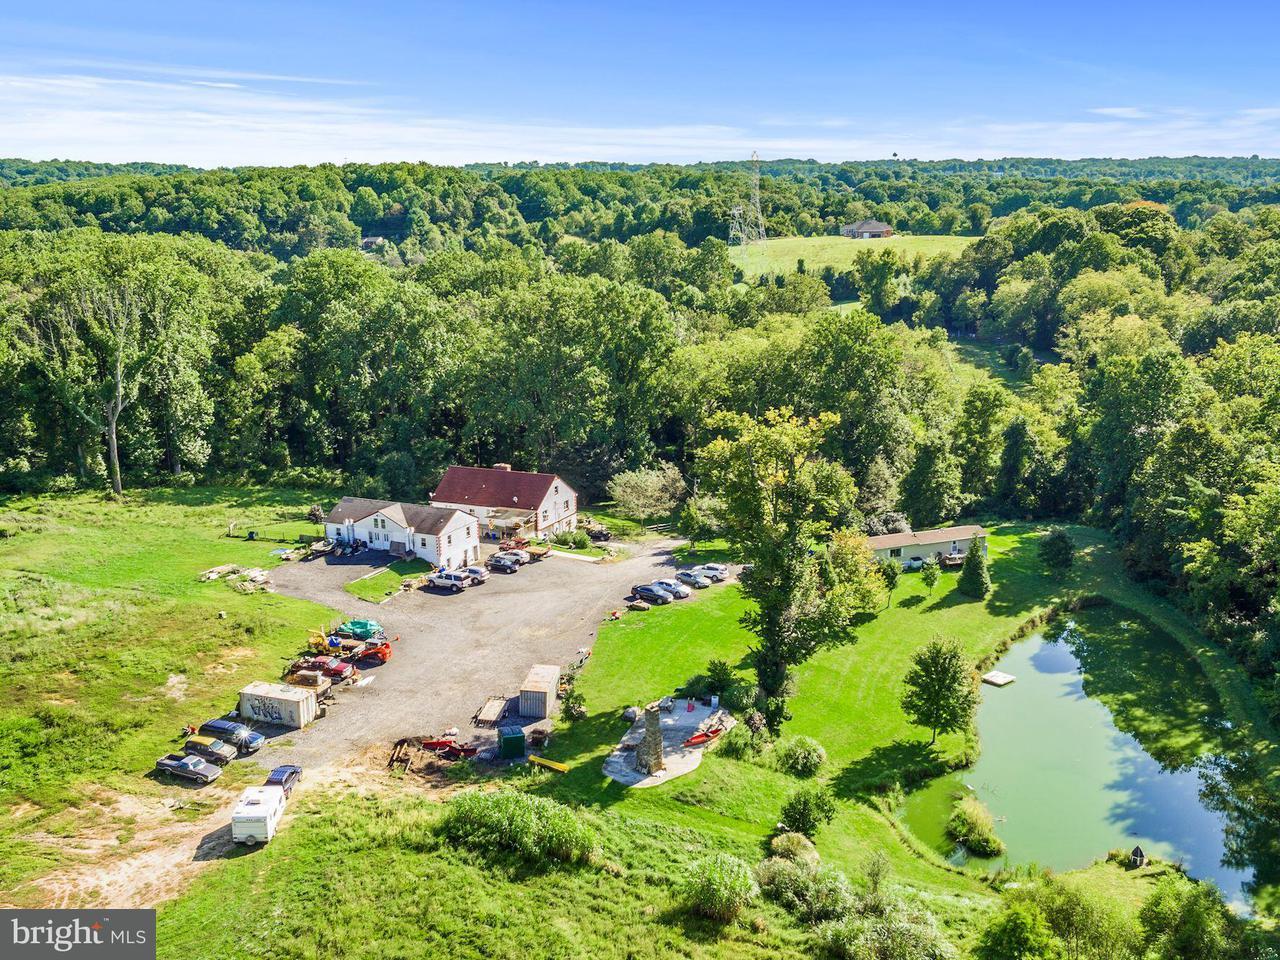 獨棟家庭住宅 為 出售 在 3236 Granite Road 3236 Granite Road Woodstock, 馬里蘭州 21163 美國